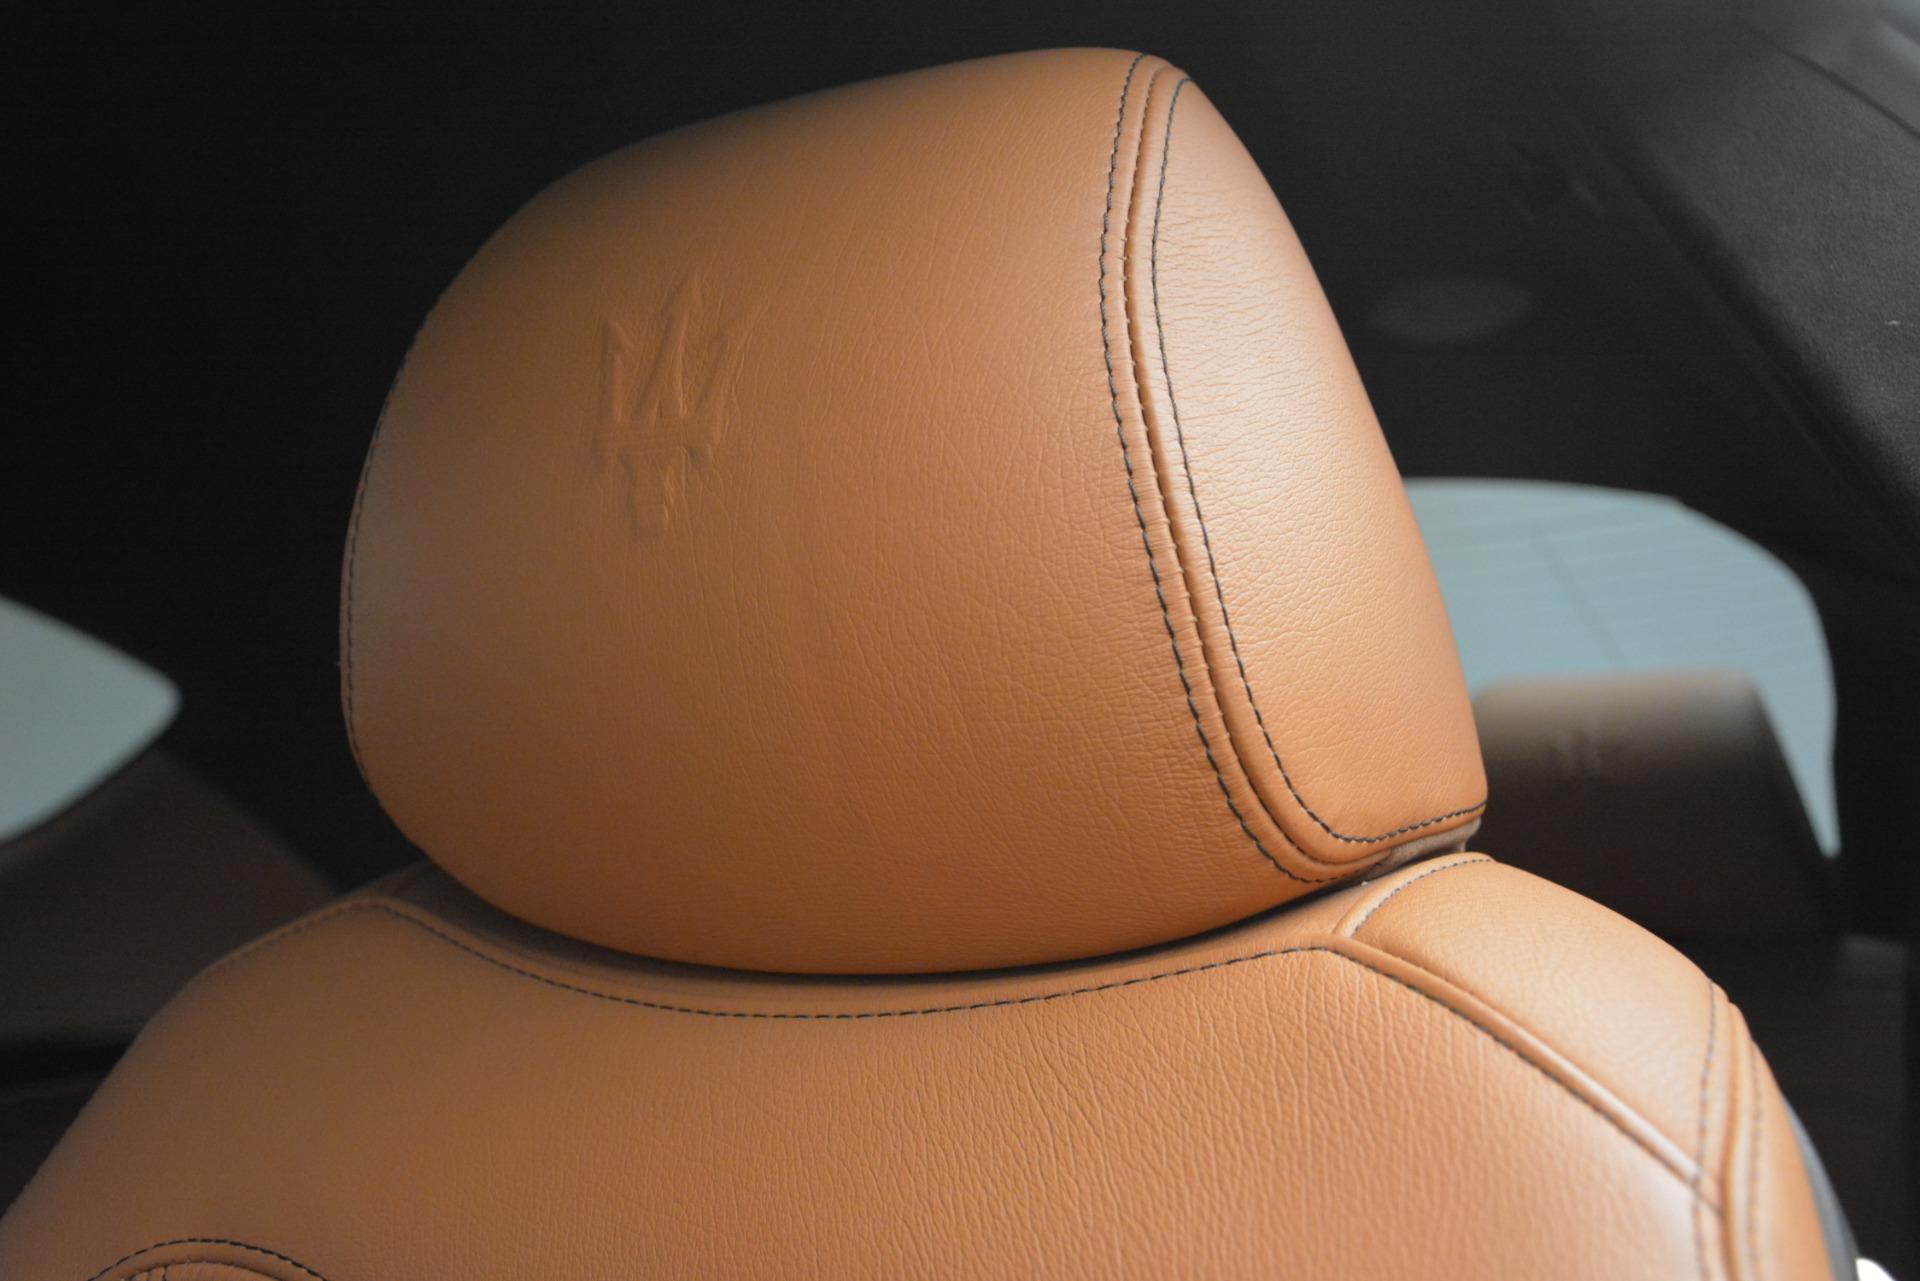 Used 2011 Maserati GranTurismo S Automatic For Sale In Westport, CT 3061_p21